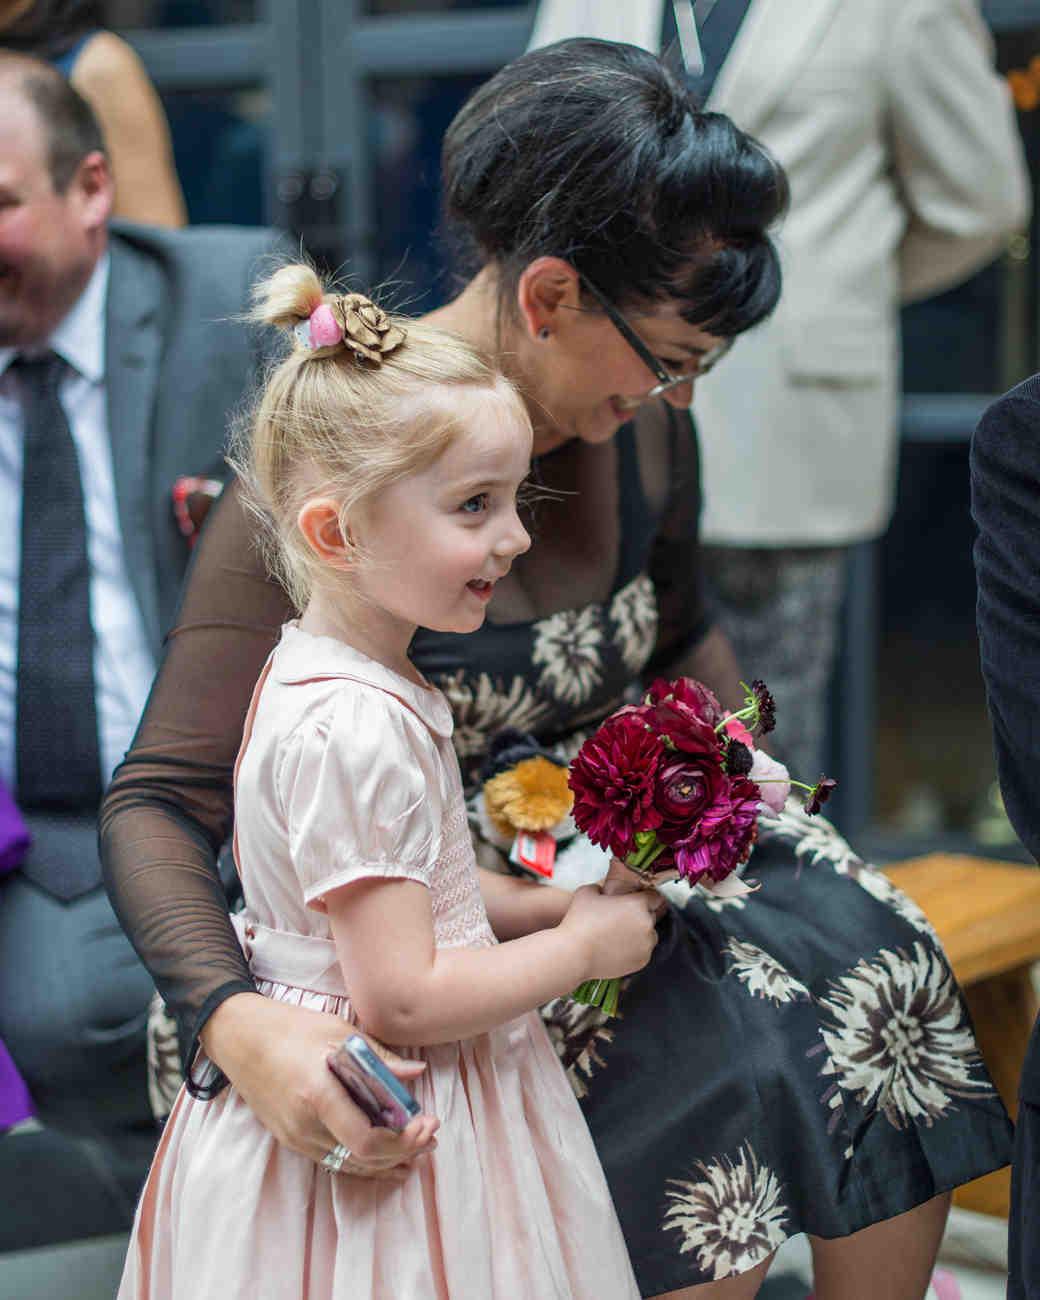 caitlin-michael-wedding-flowergirl-295-s111835-0415.jpg